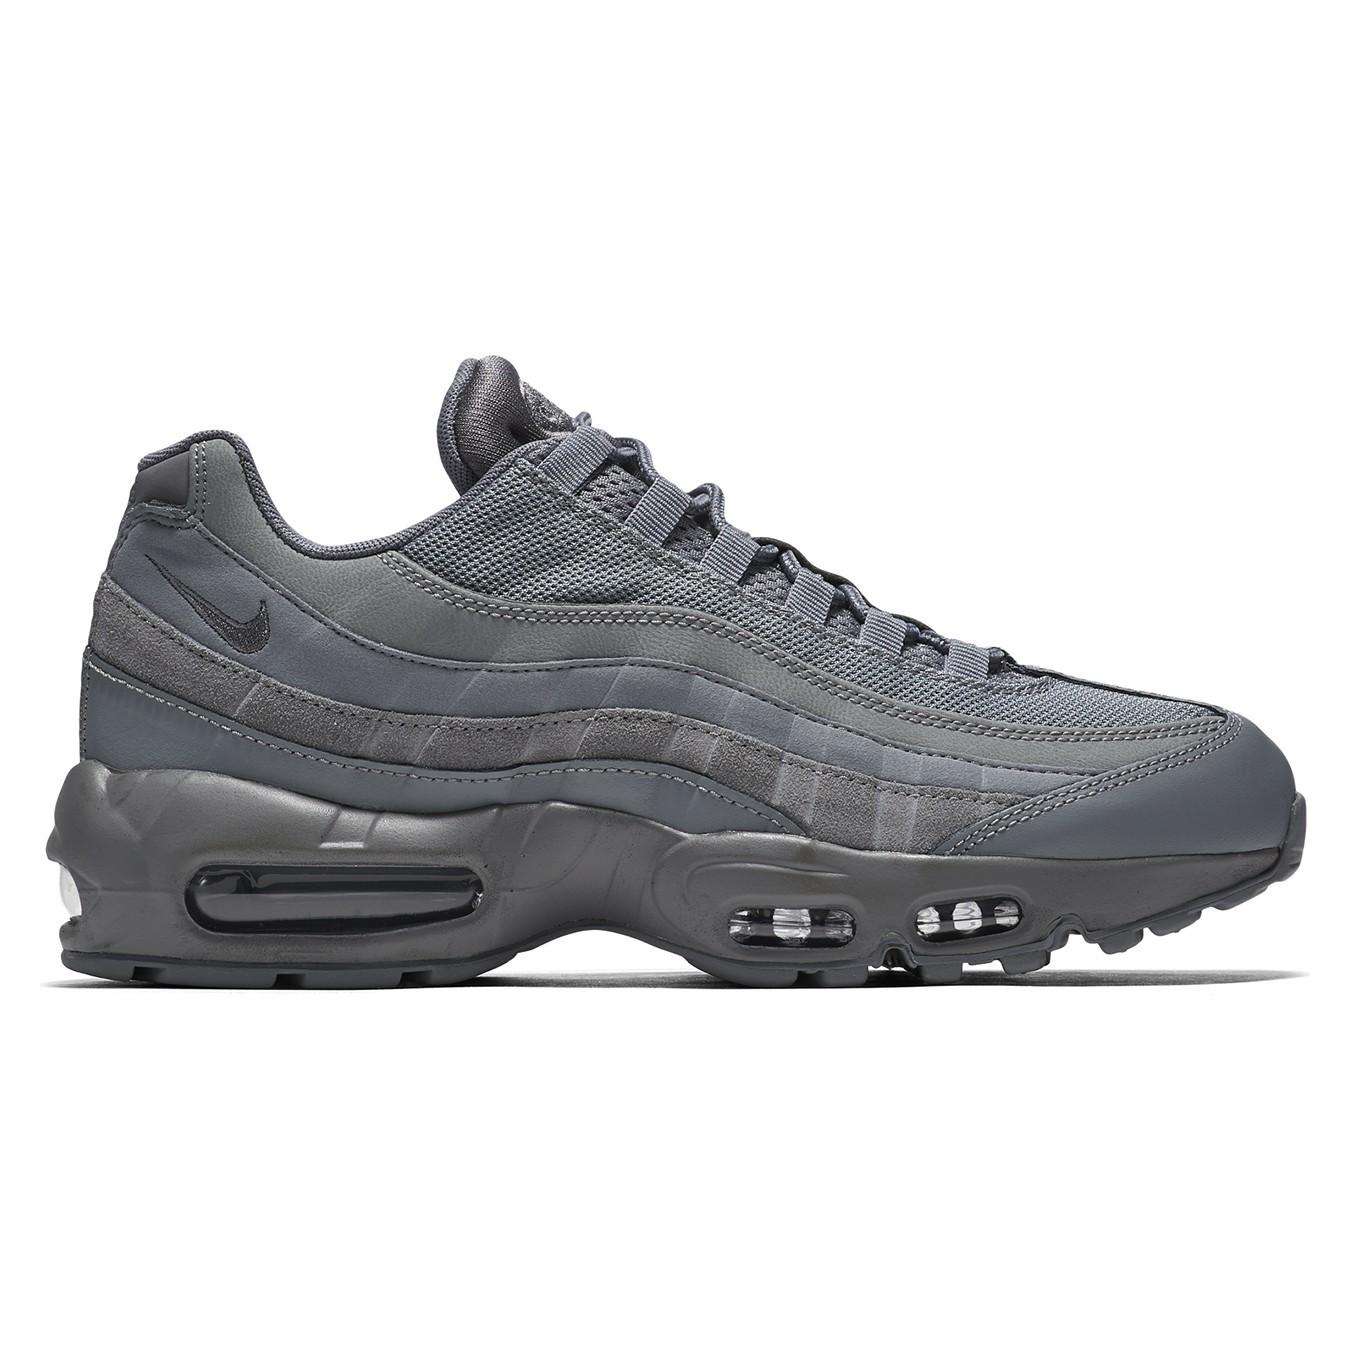 sports shoes 7dd3a e6253 ... switzerland it sportswear nike 24339 air 24339 nike scarpe 95  shapestore max essential 48b4a0 ec198 43f92